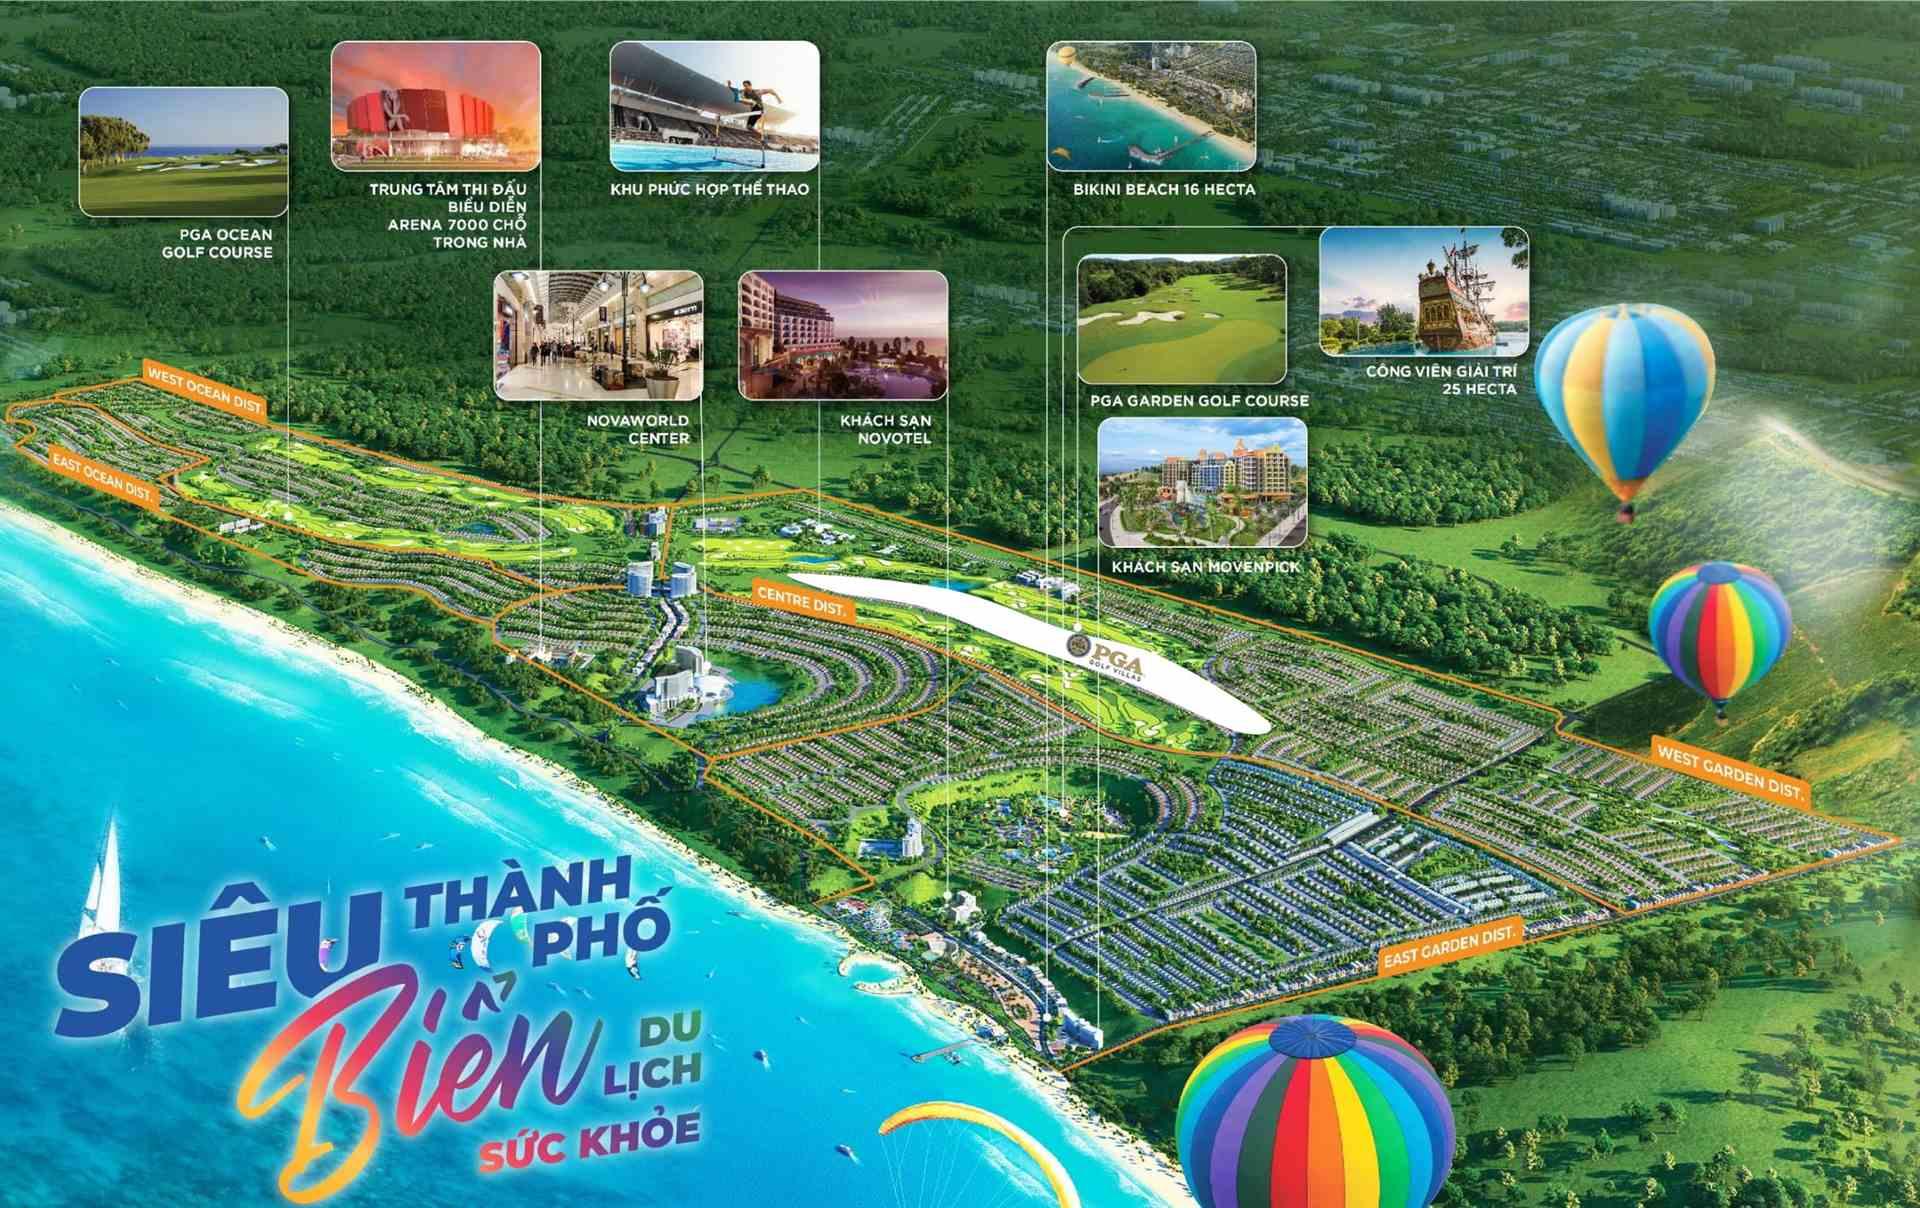 vi-tri-phan-khu-5-Villas-Golf-NovaWorld-Phan-Thiet-Binh-Thuan-Novaland.